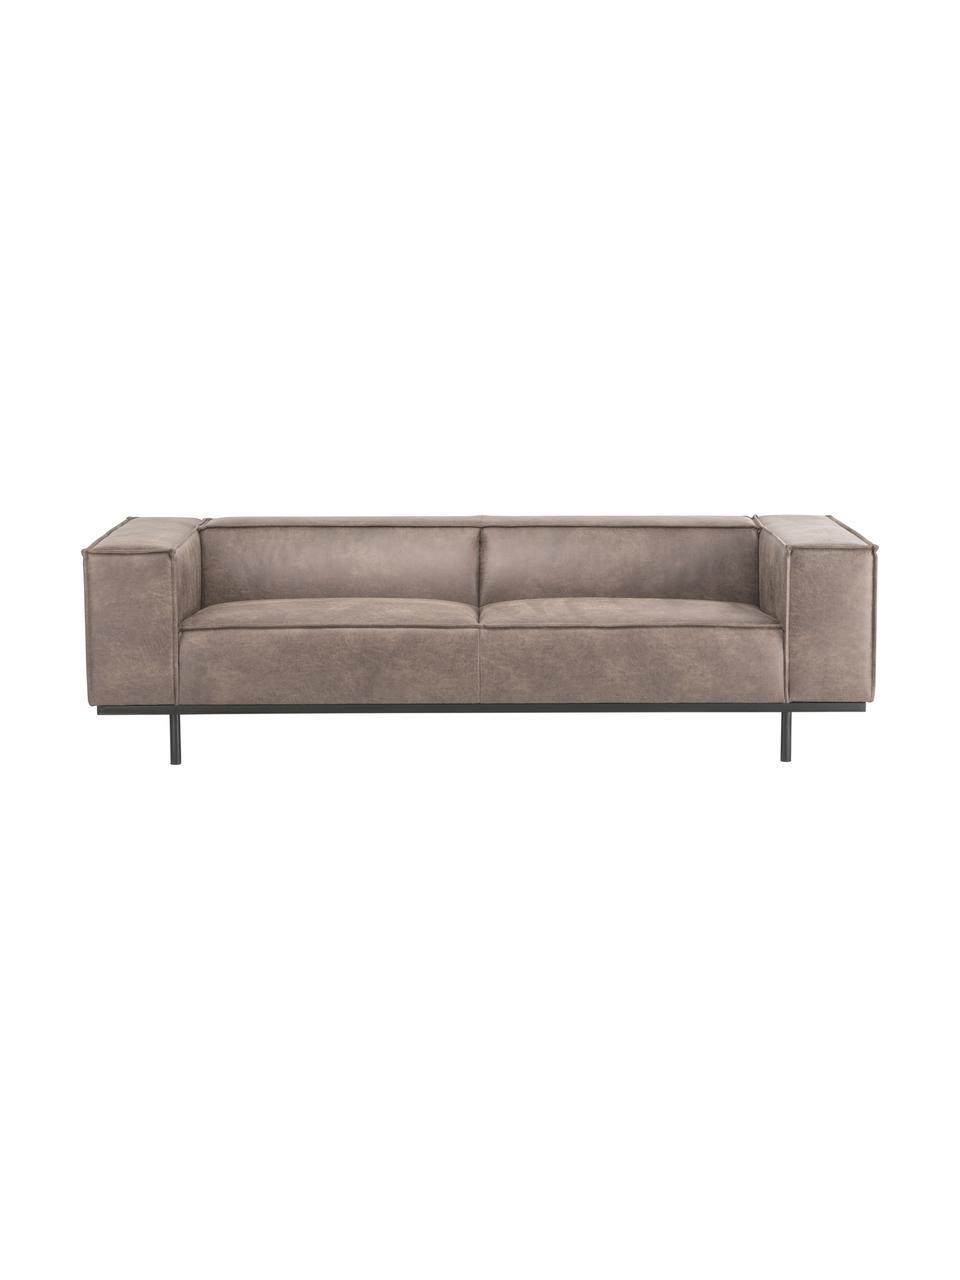 Leder-Sofa Abigail (3-Sitzer) in Cognacfarben mit Metall-Füßen, Bezug: Lederfaserstoff (70% Lede, Beine: Stahl, lackiert, Leder Cognac, B 230 x T 95 cm